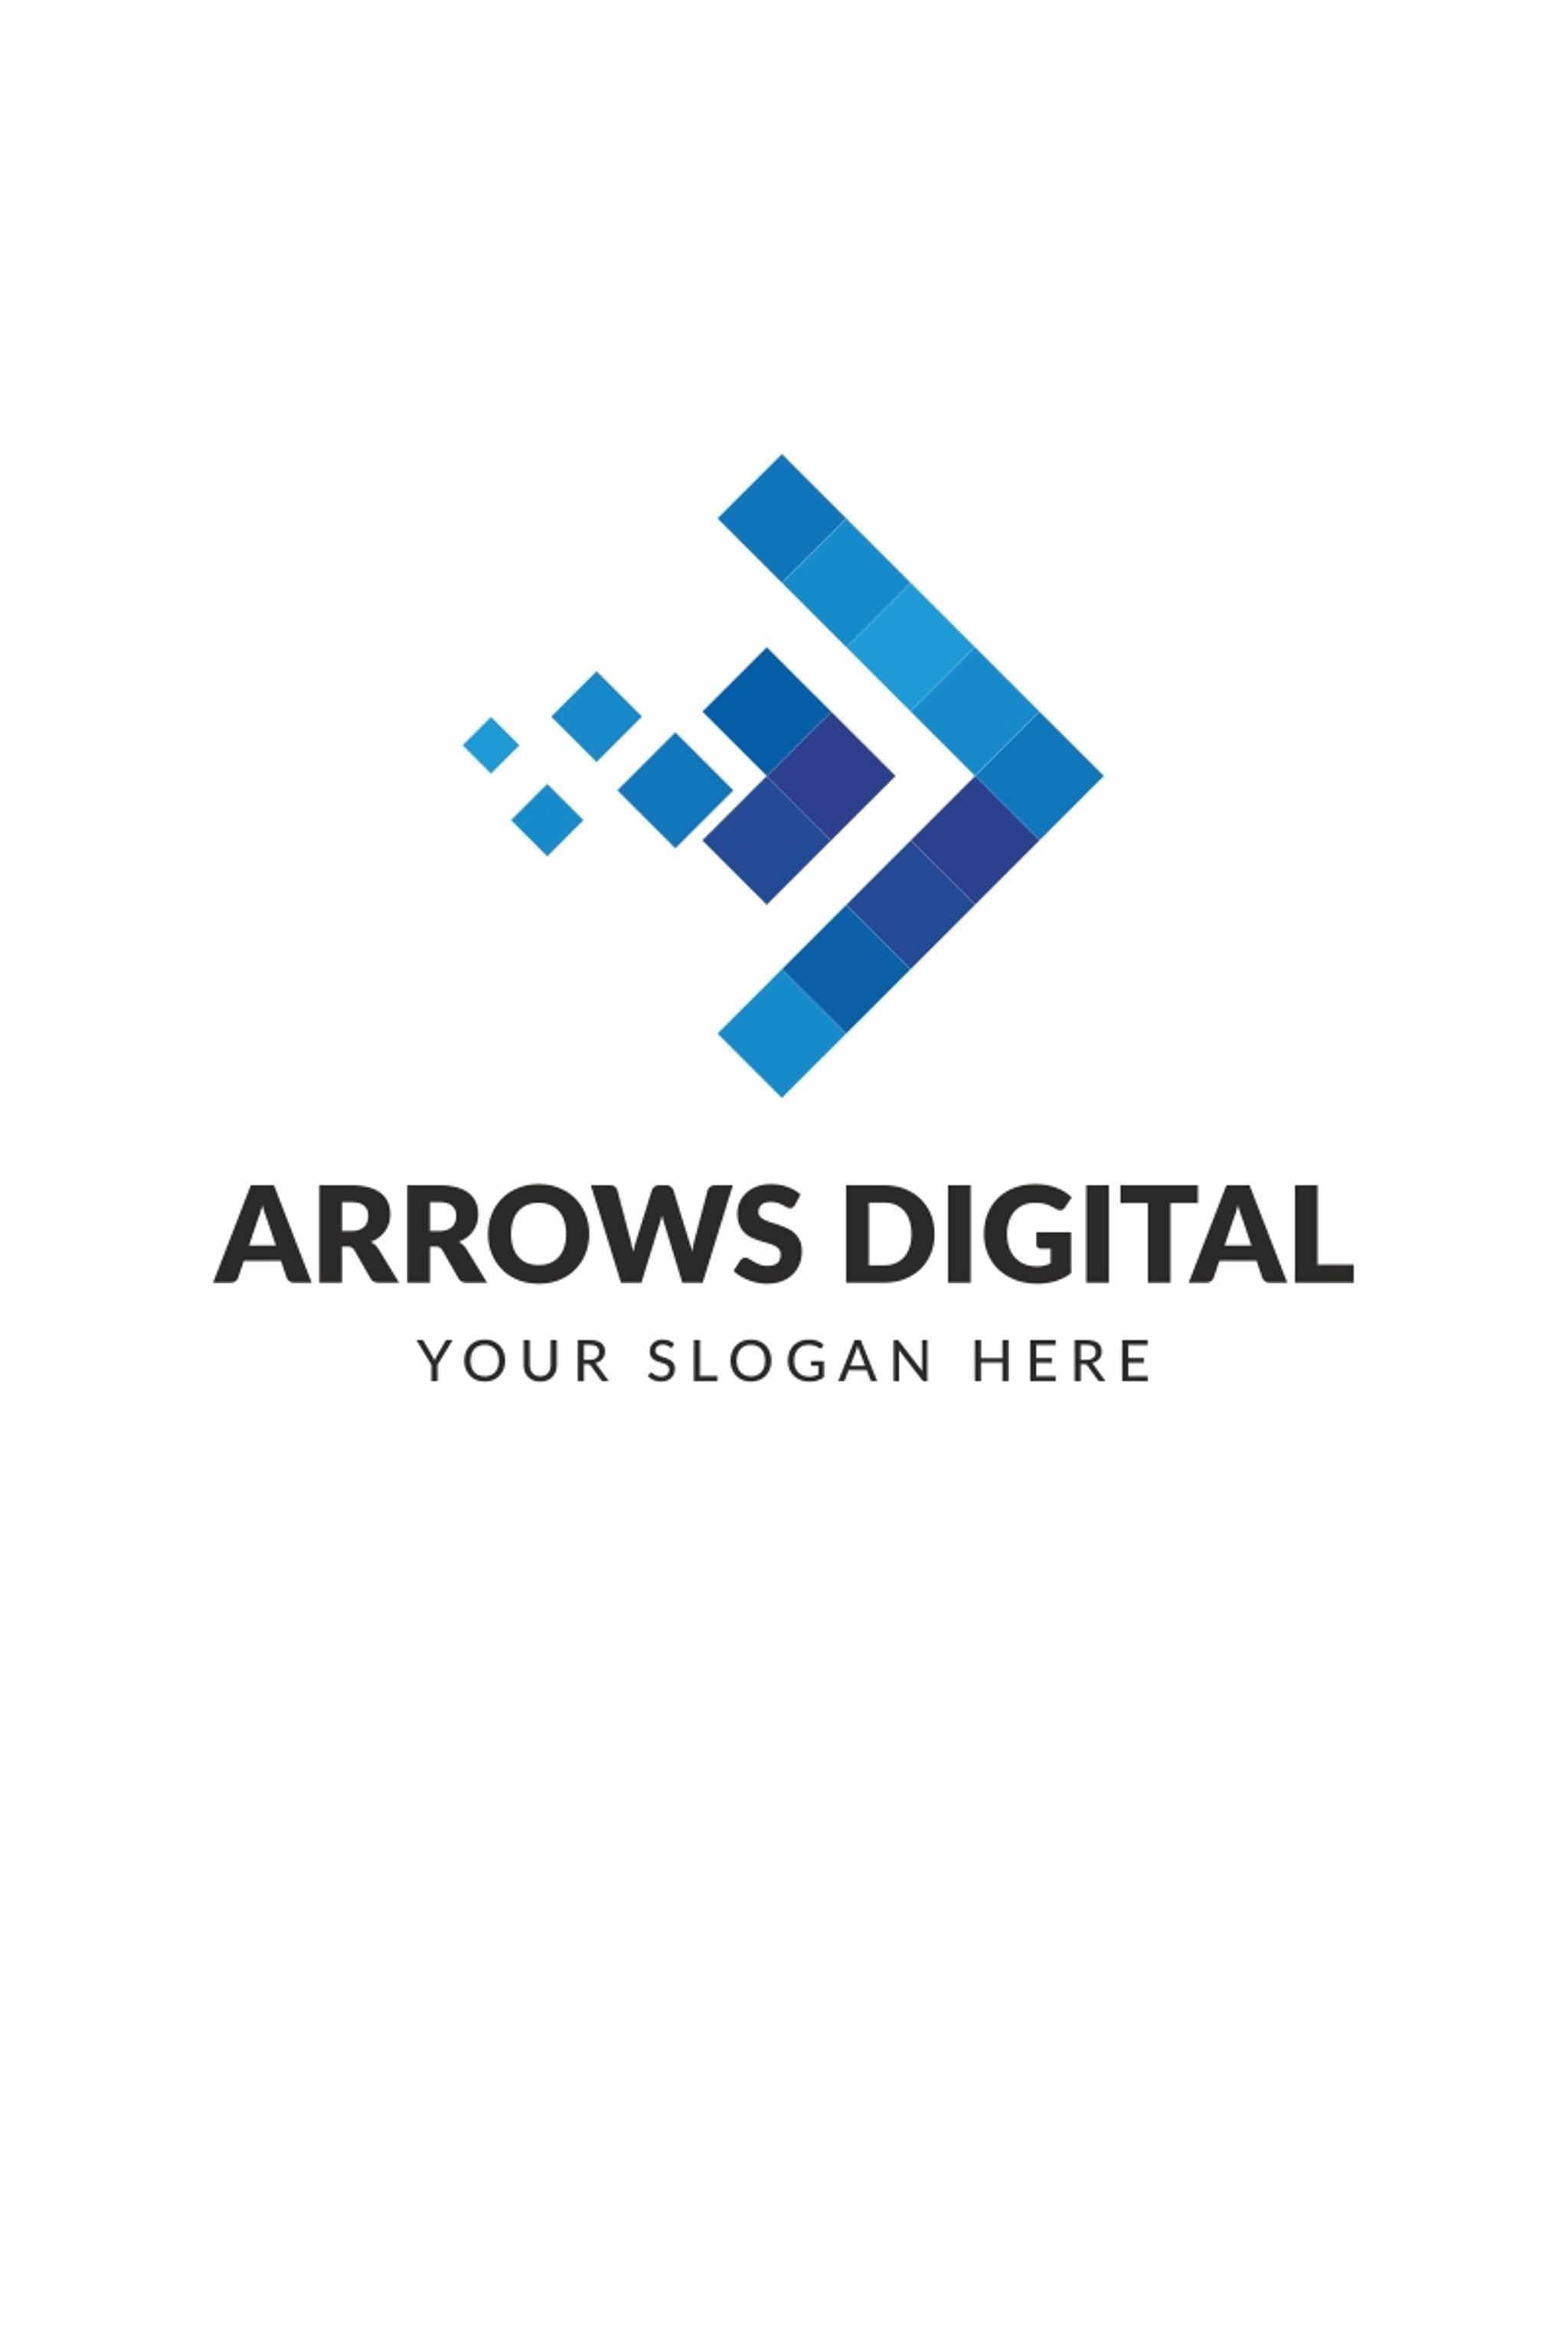 Arrows Digital - Logo Template #67345 | Logo templates ...